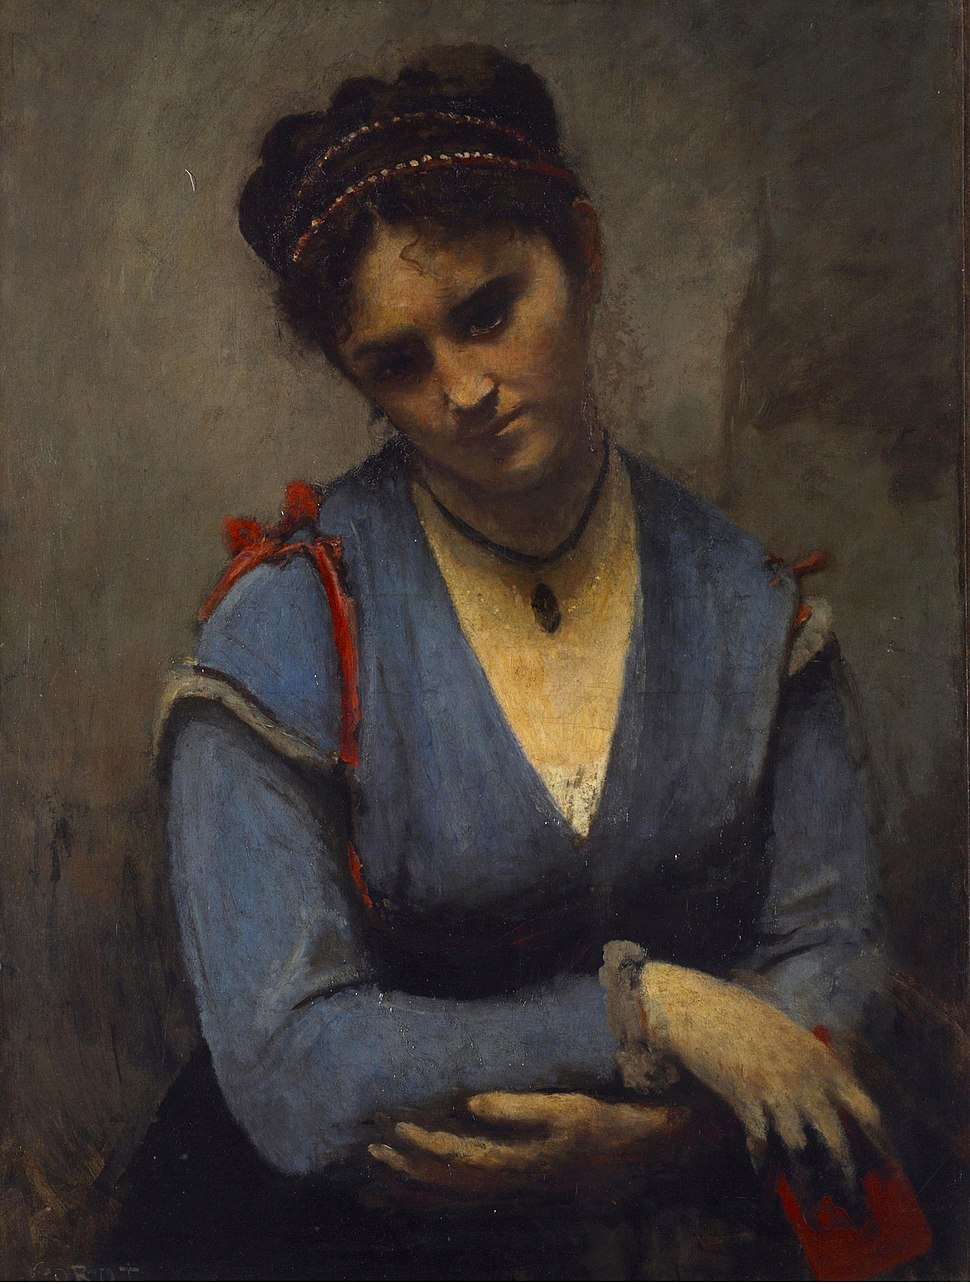 Jean Baptiste Camille - Portrait of Mariette Gambay